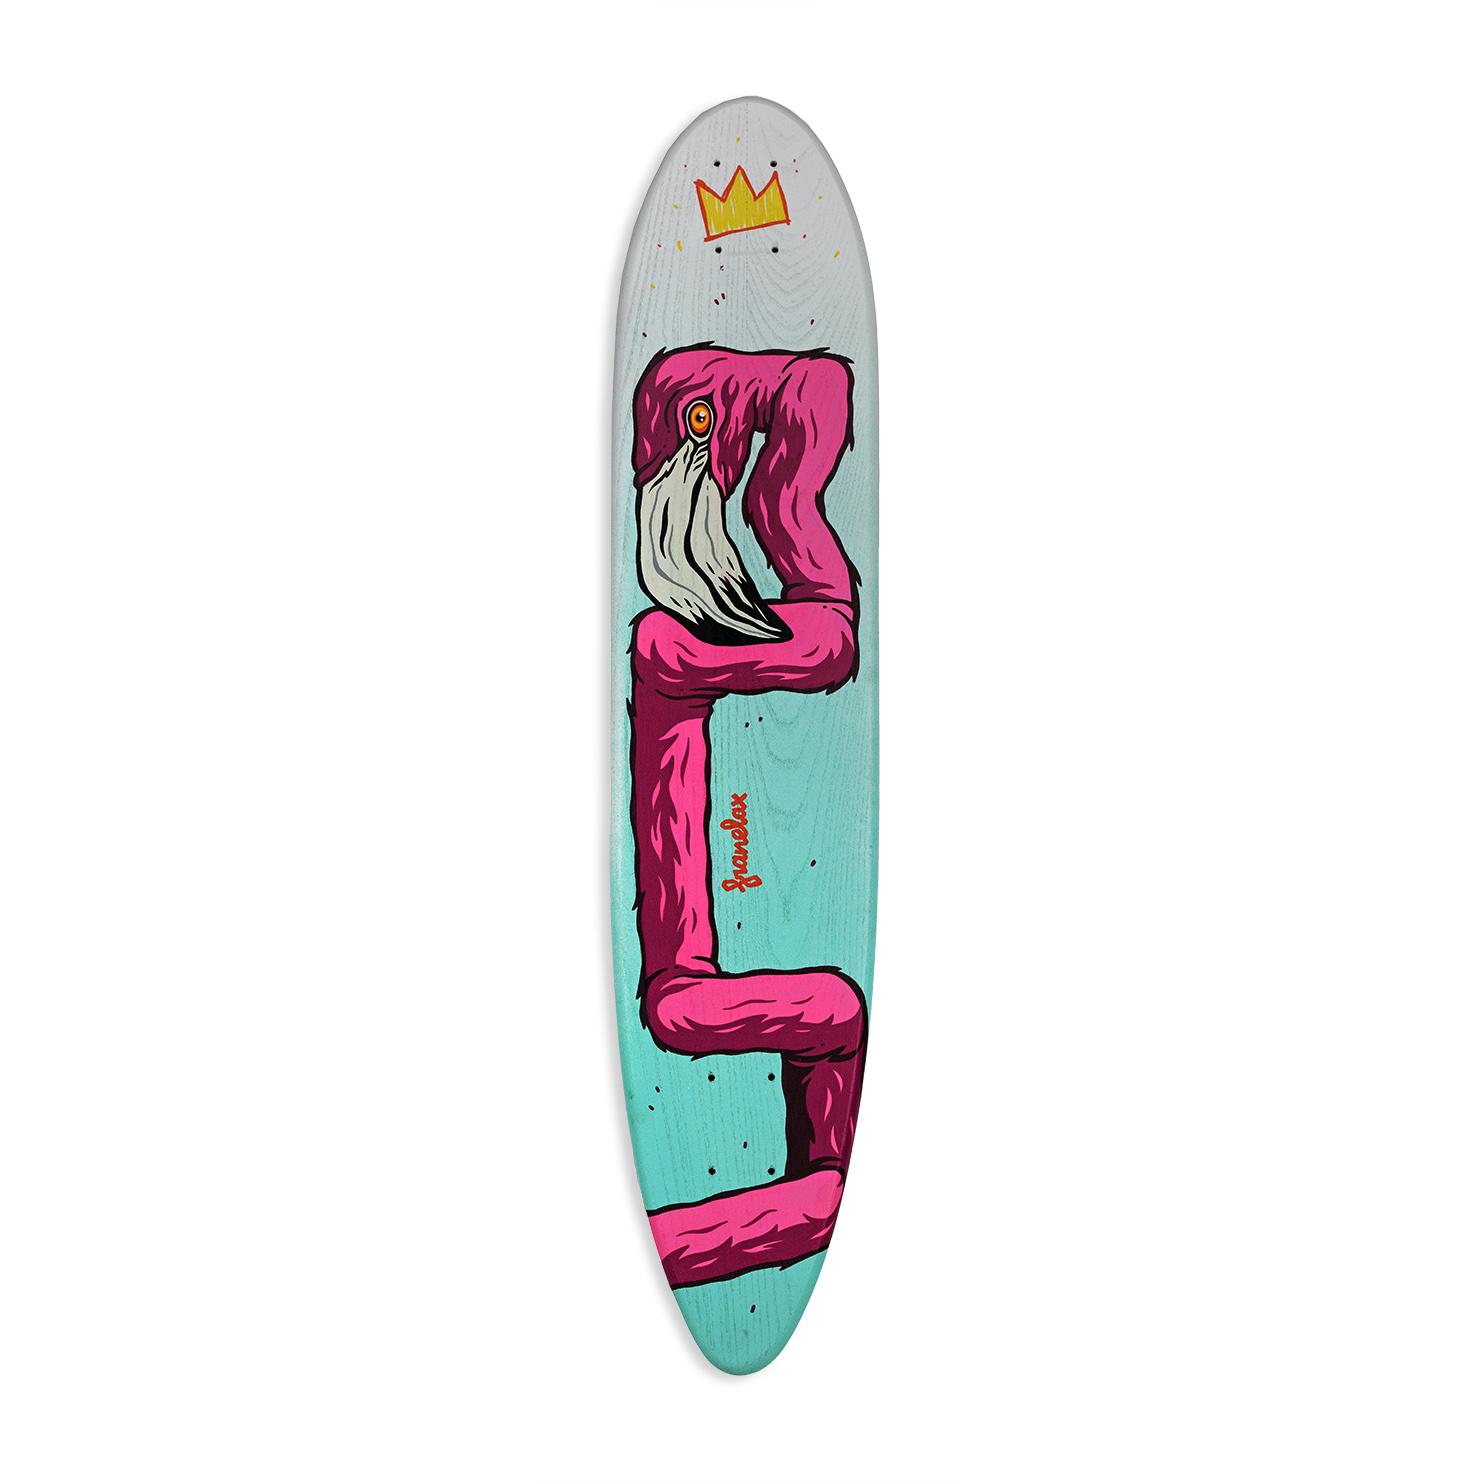 King-Flamingo-LongDays-Lonboards